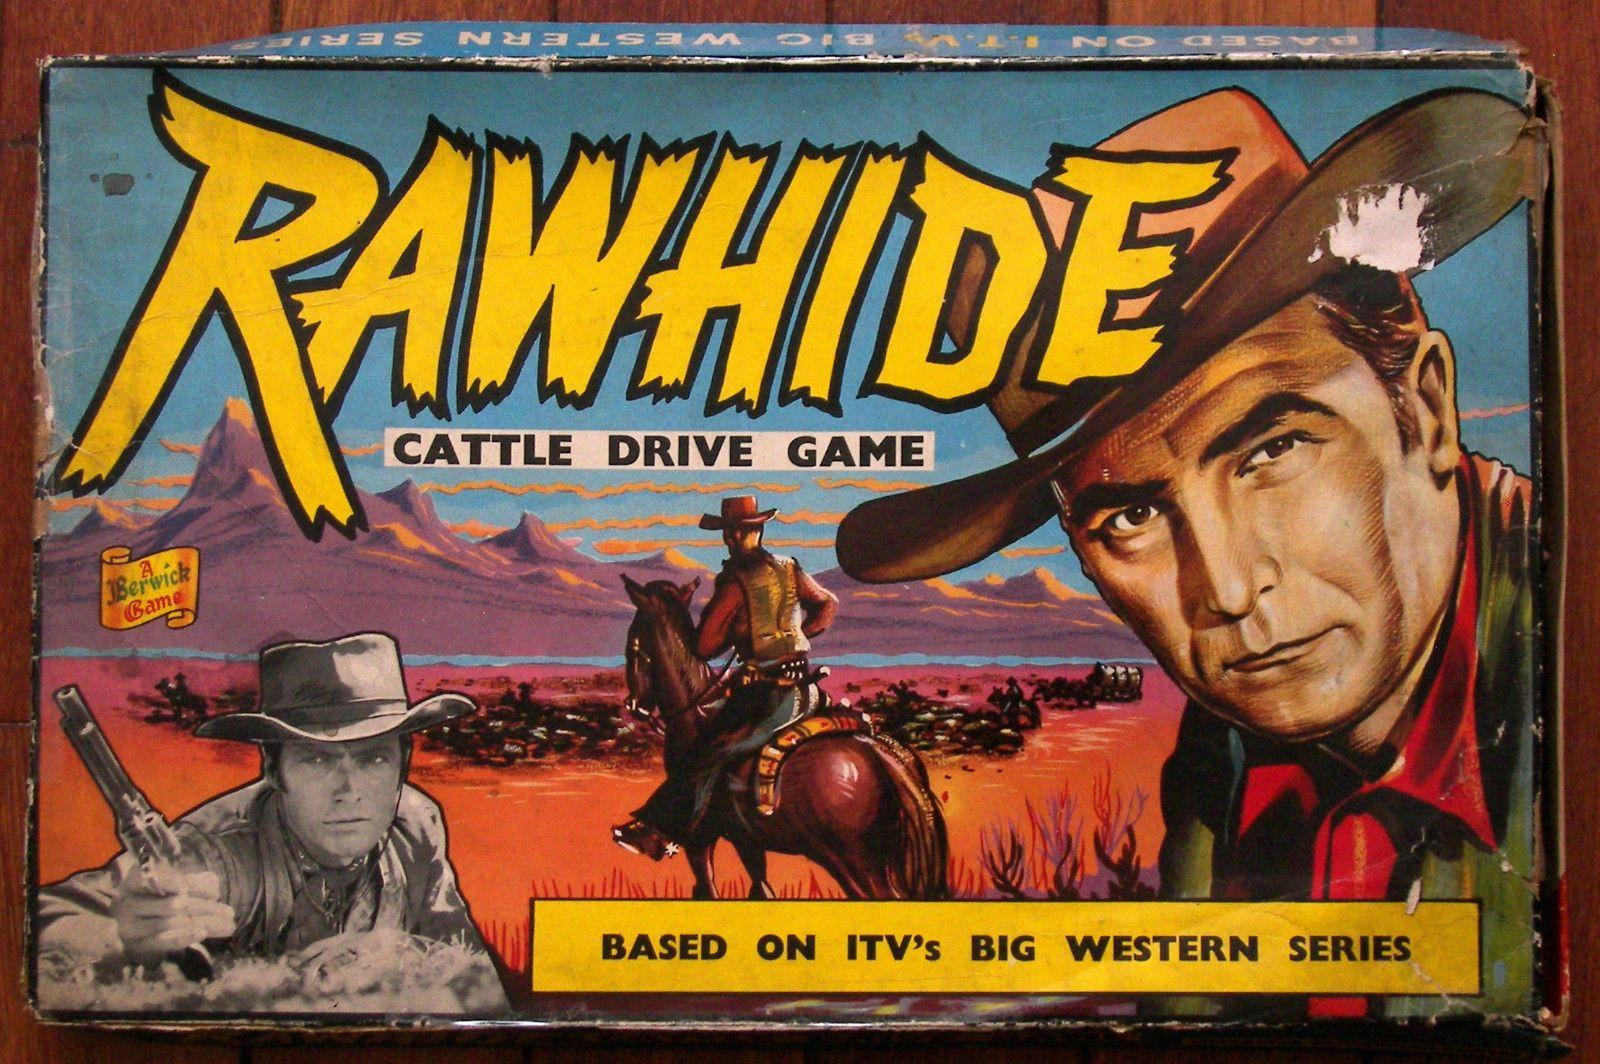 1960 rawhide cattle drive board game tv western clint